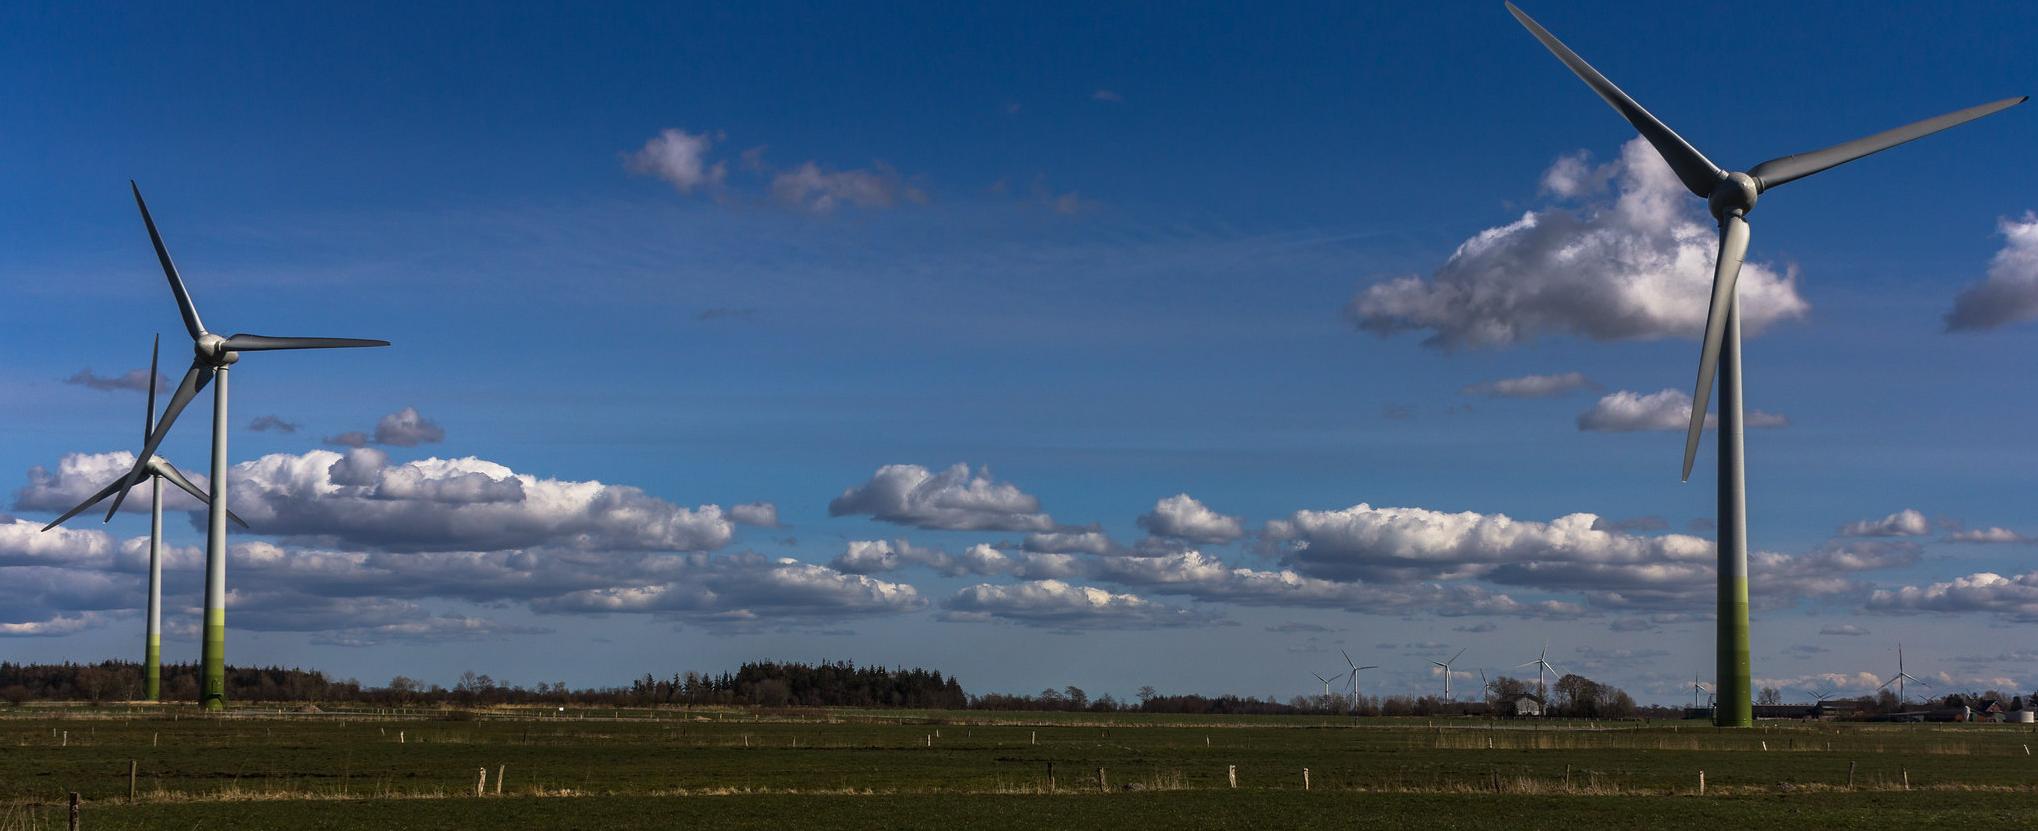 Windkraftanlagen des Windparks Bulack